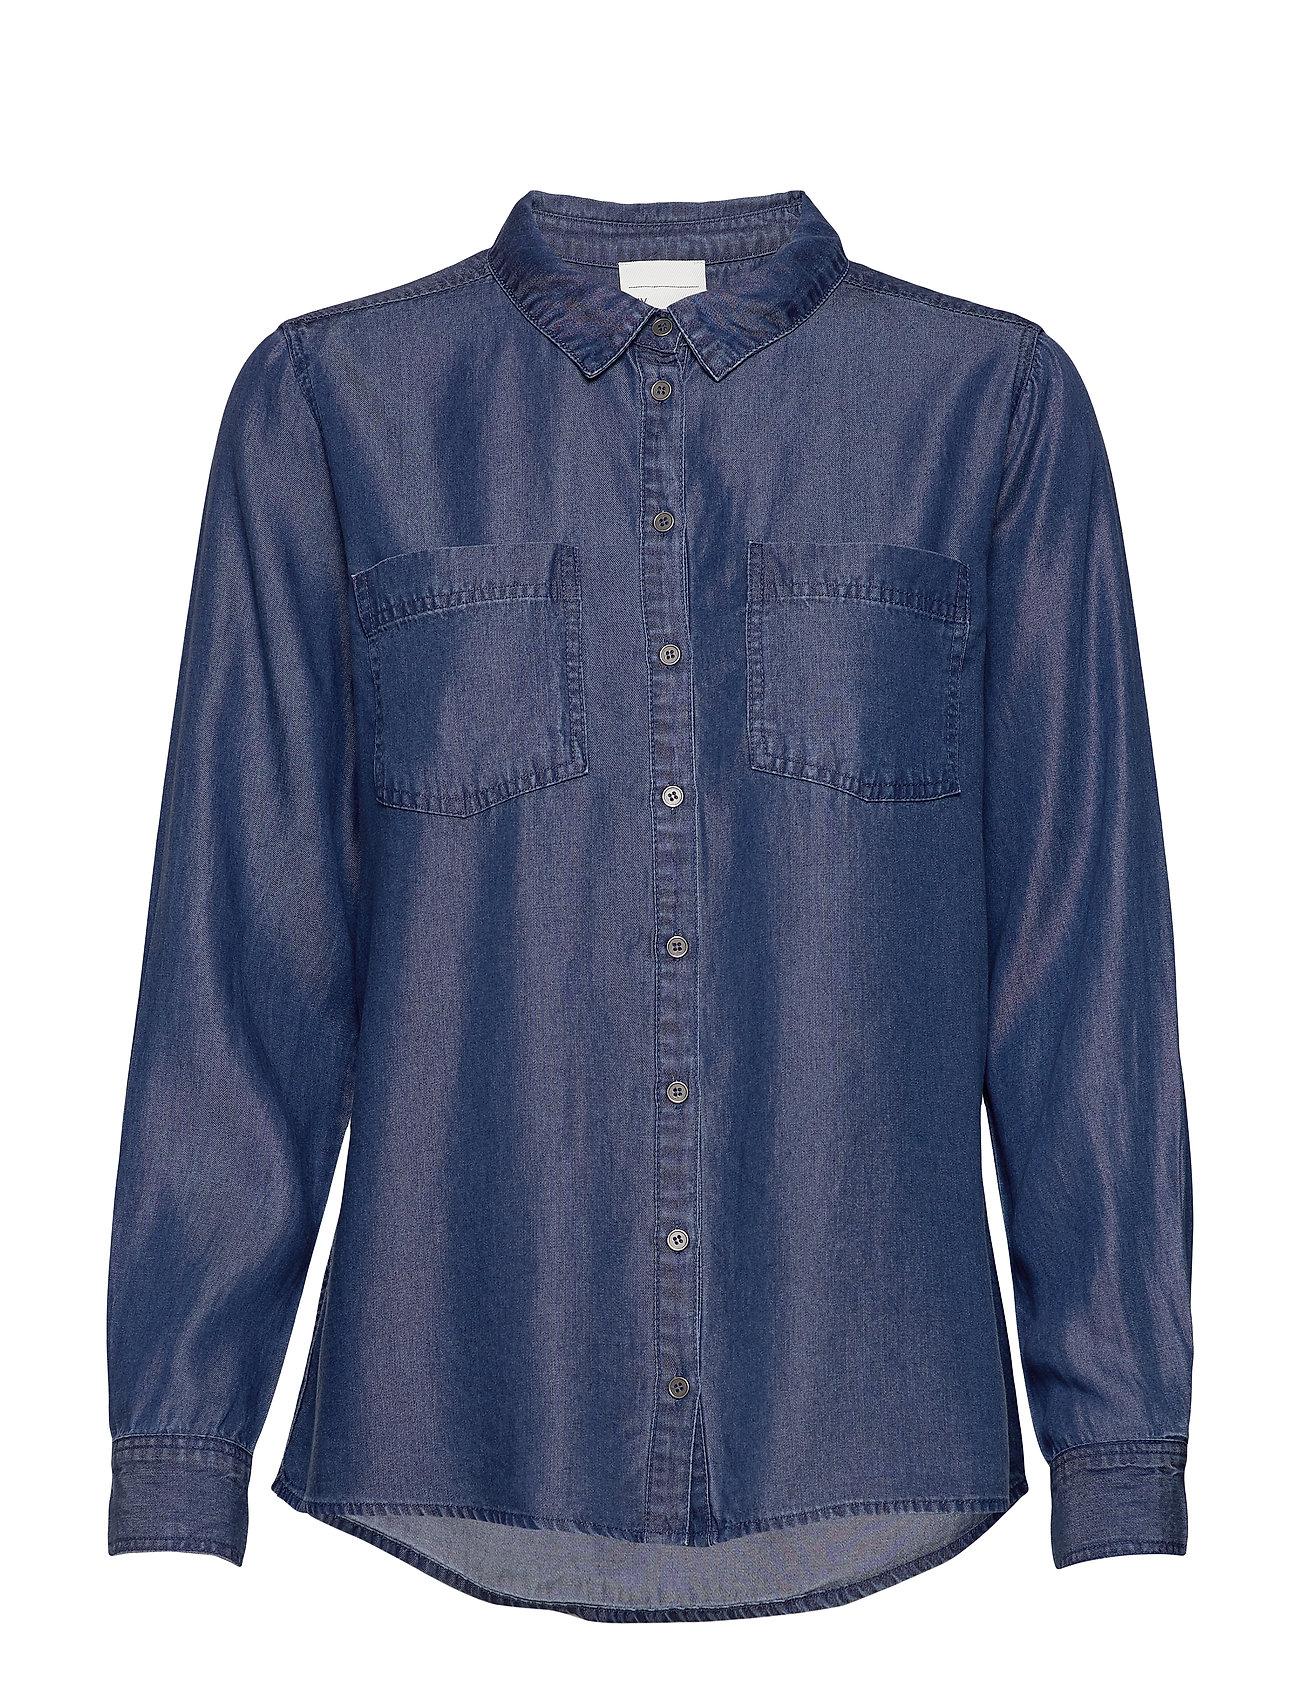 15 The Denim Shirt Pitkähihainen Paita Sininen Denim Hunter